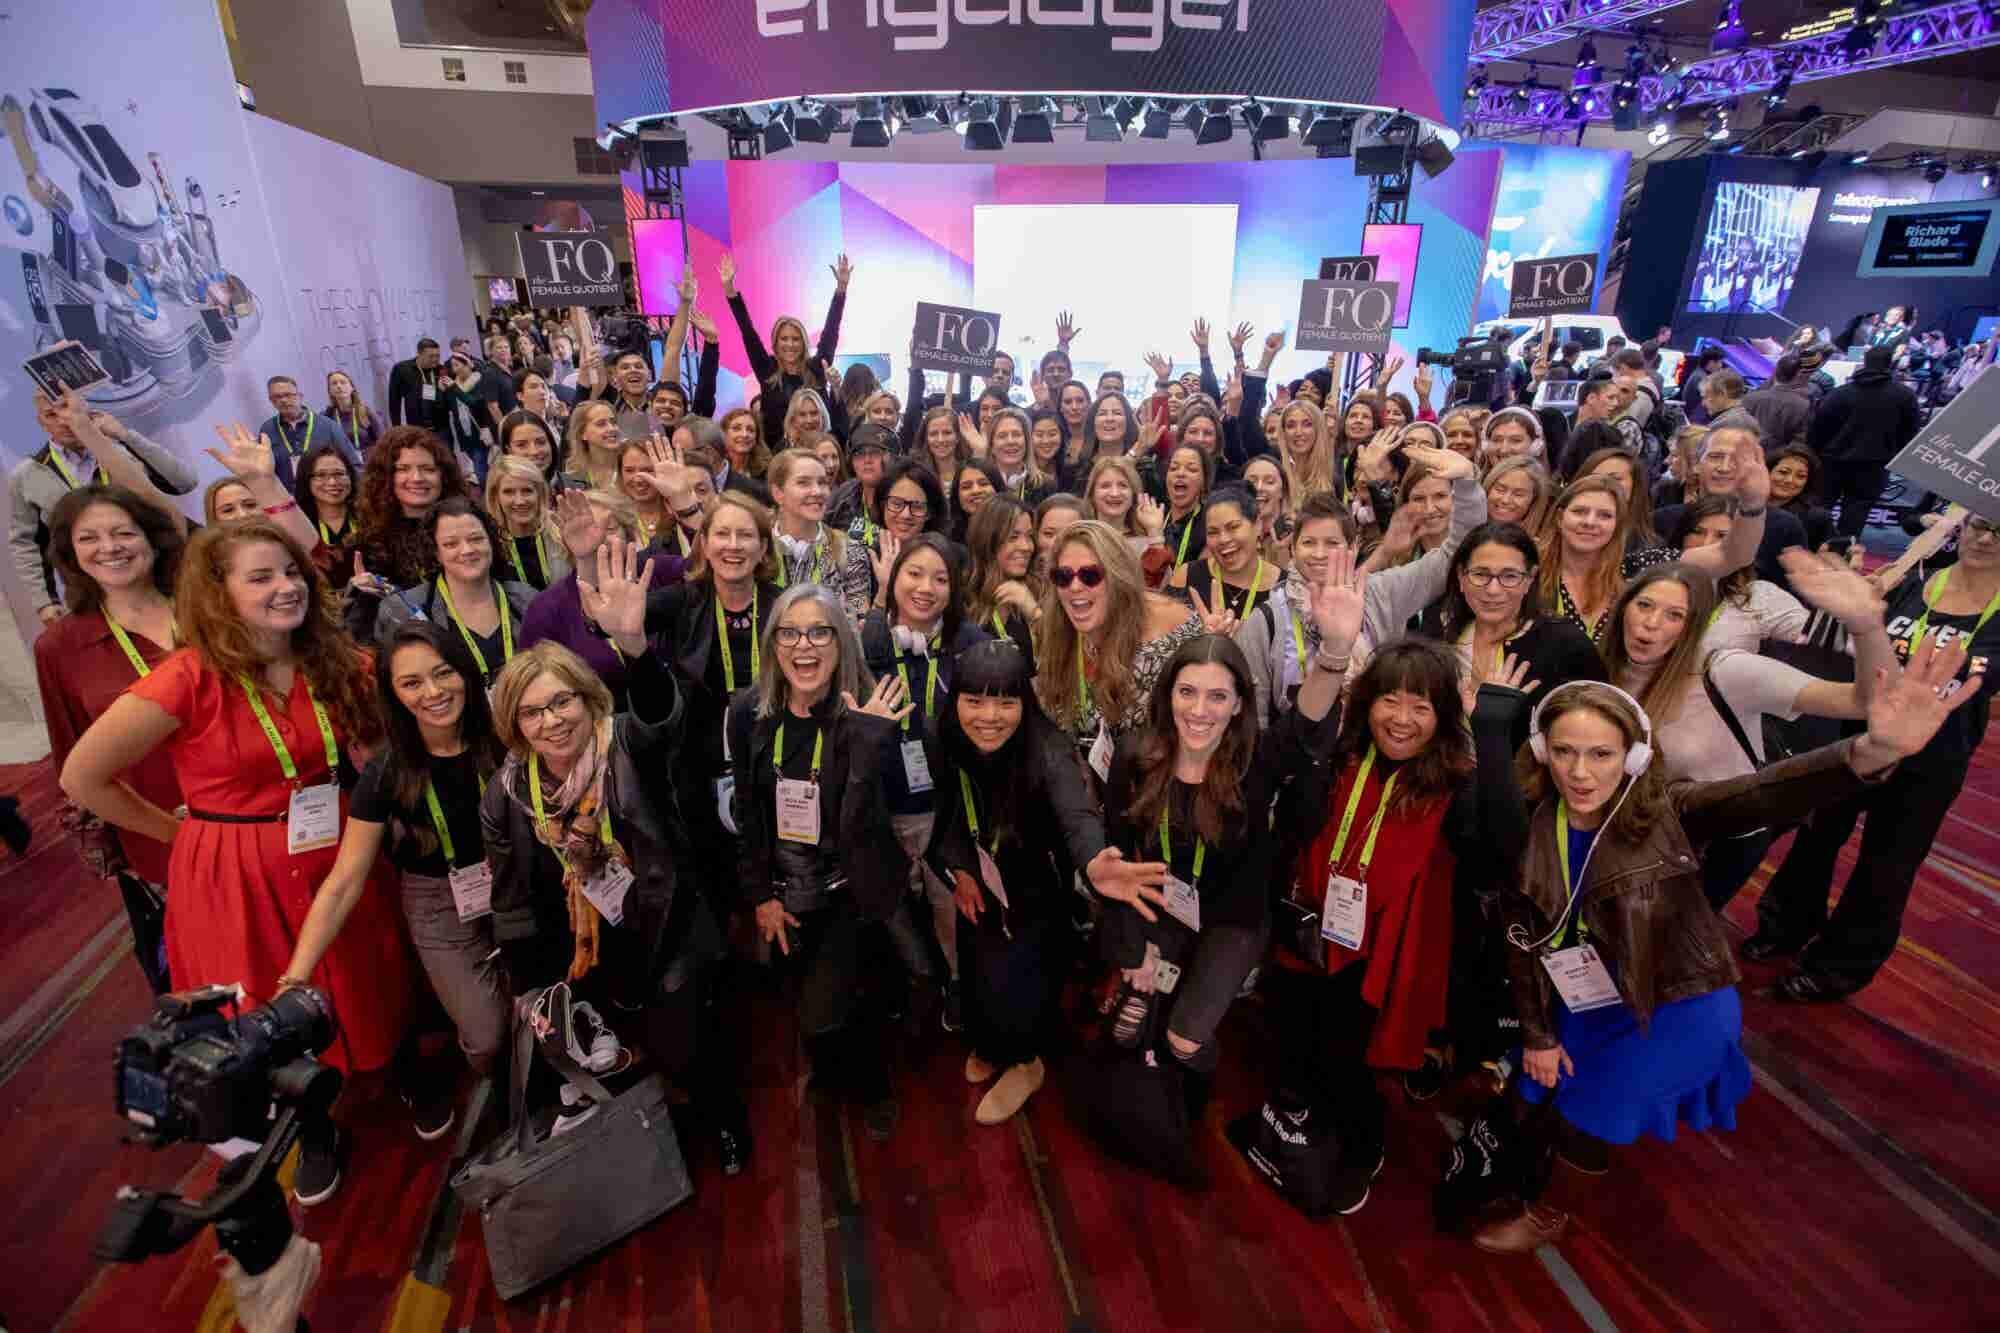 Shelley Zalis Makes Sure That 'Women's Work' Gets the Respect It Deserves